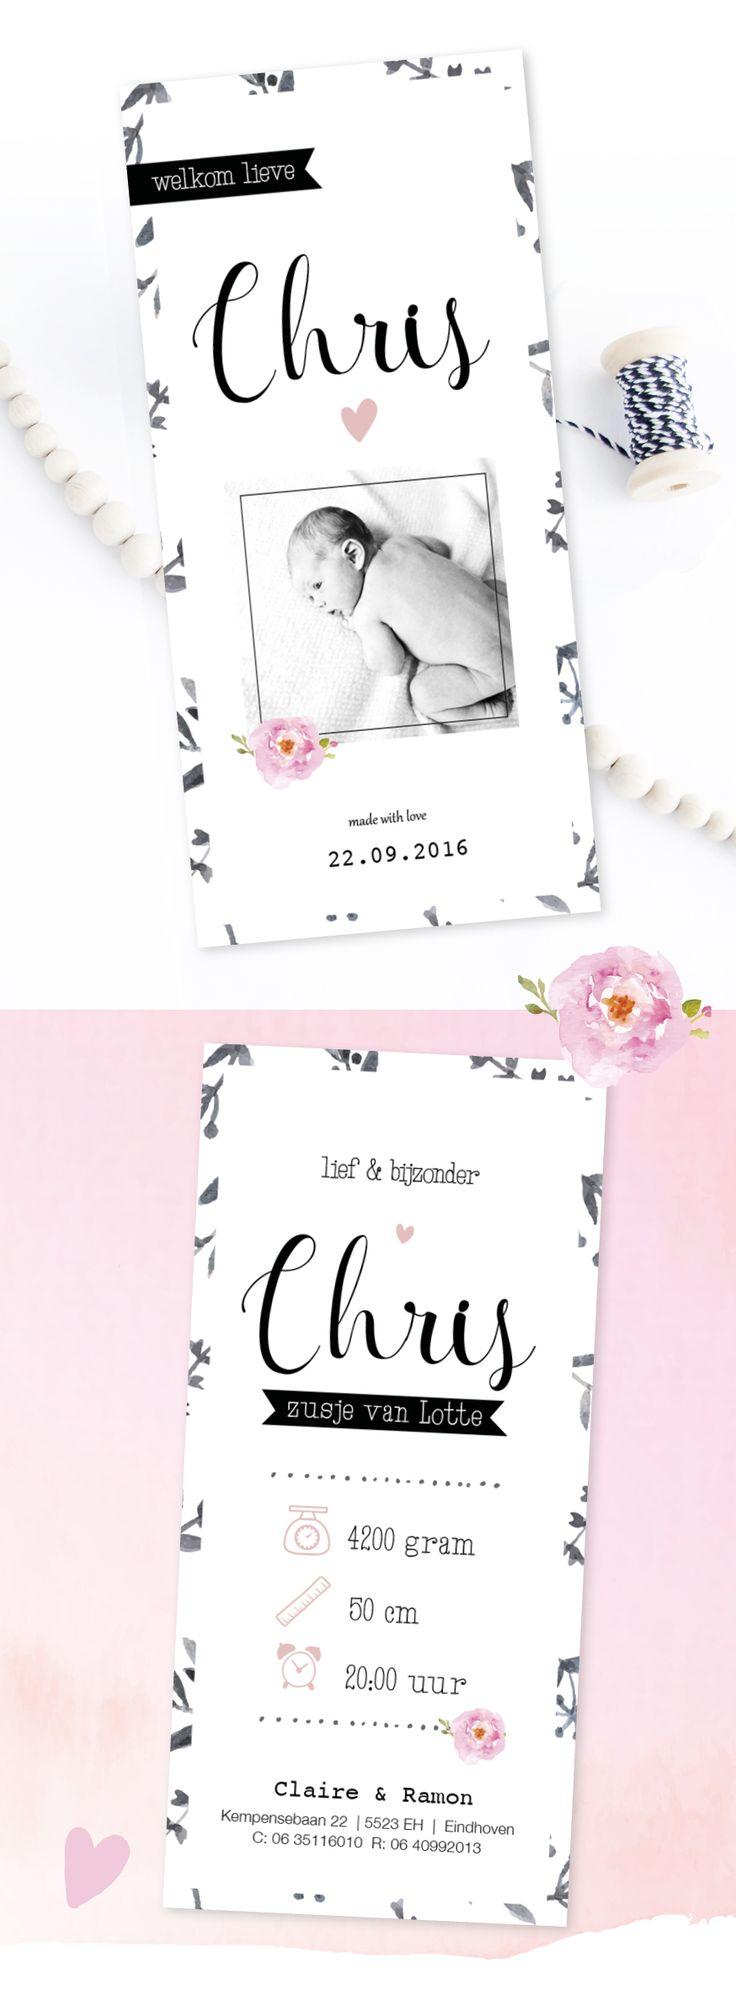 Lief geboortekaartje meisje met foto   bloem   waterverf   watercolor background   roos   roze   zwart wit   icoontjes   ontwerp www.charlyfine.nl